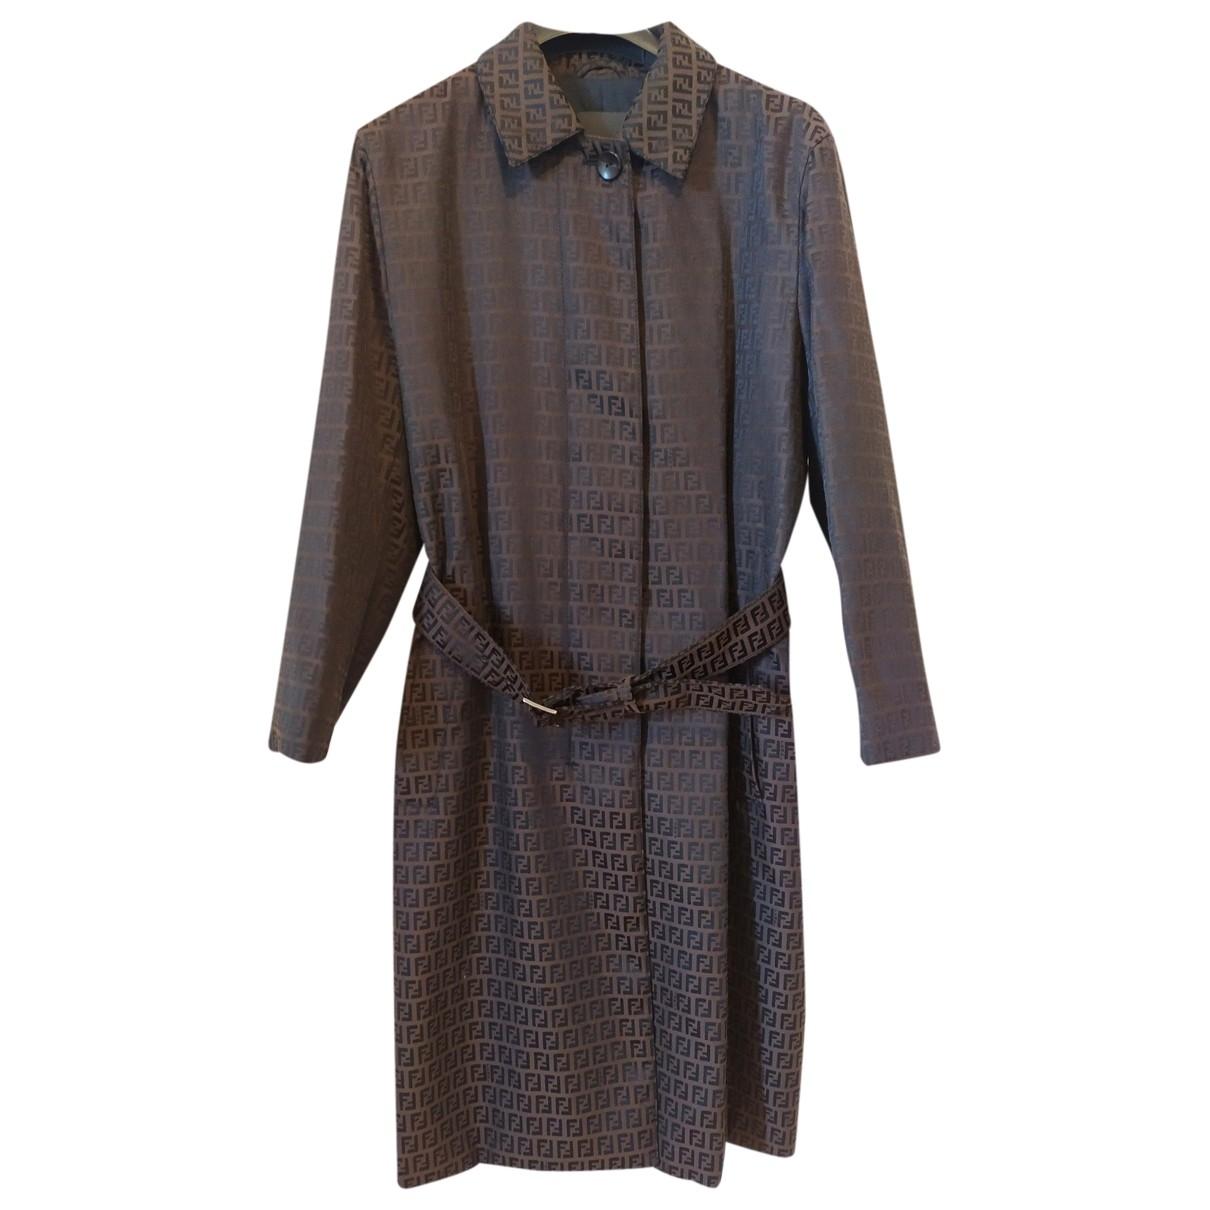 Fendi \N Brown coat for Women 44 IT